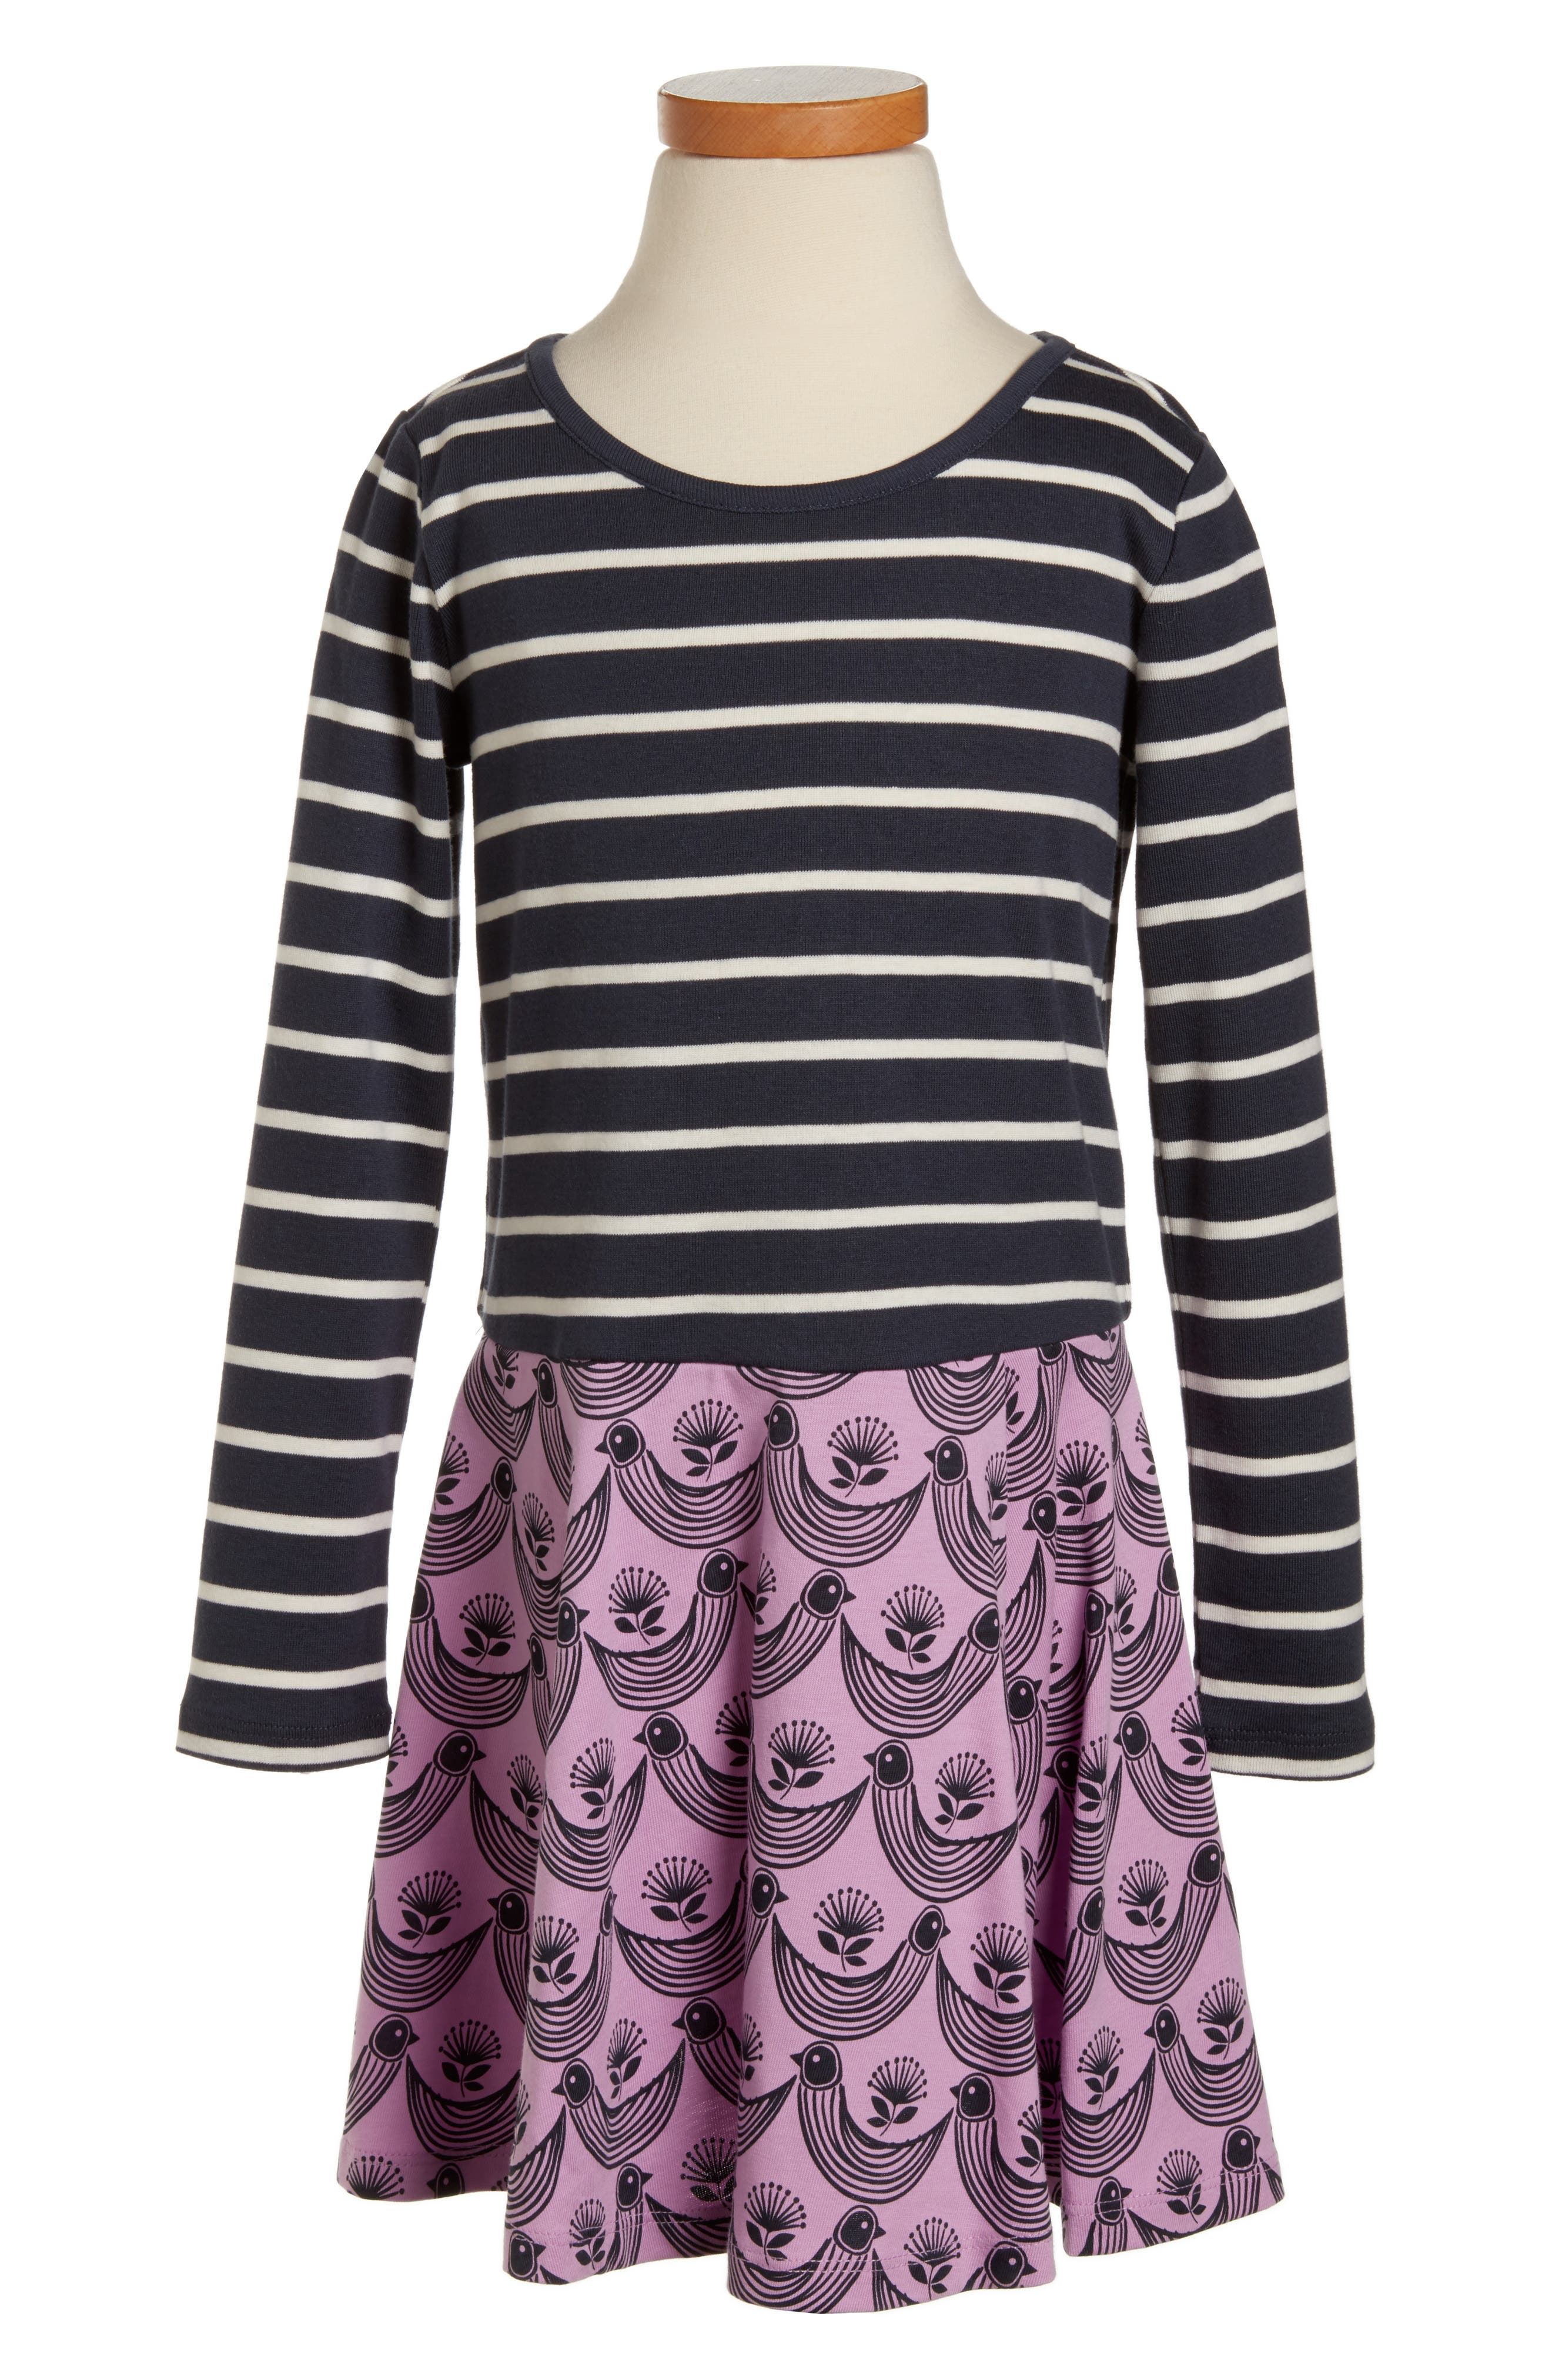 Alternate Image 1 Selected - Tea Collection Mixed Print Dress (Toddler Girls, Little Girls & Big Girls)